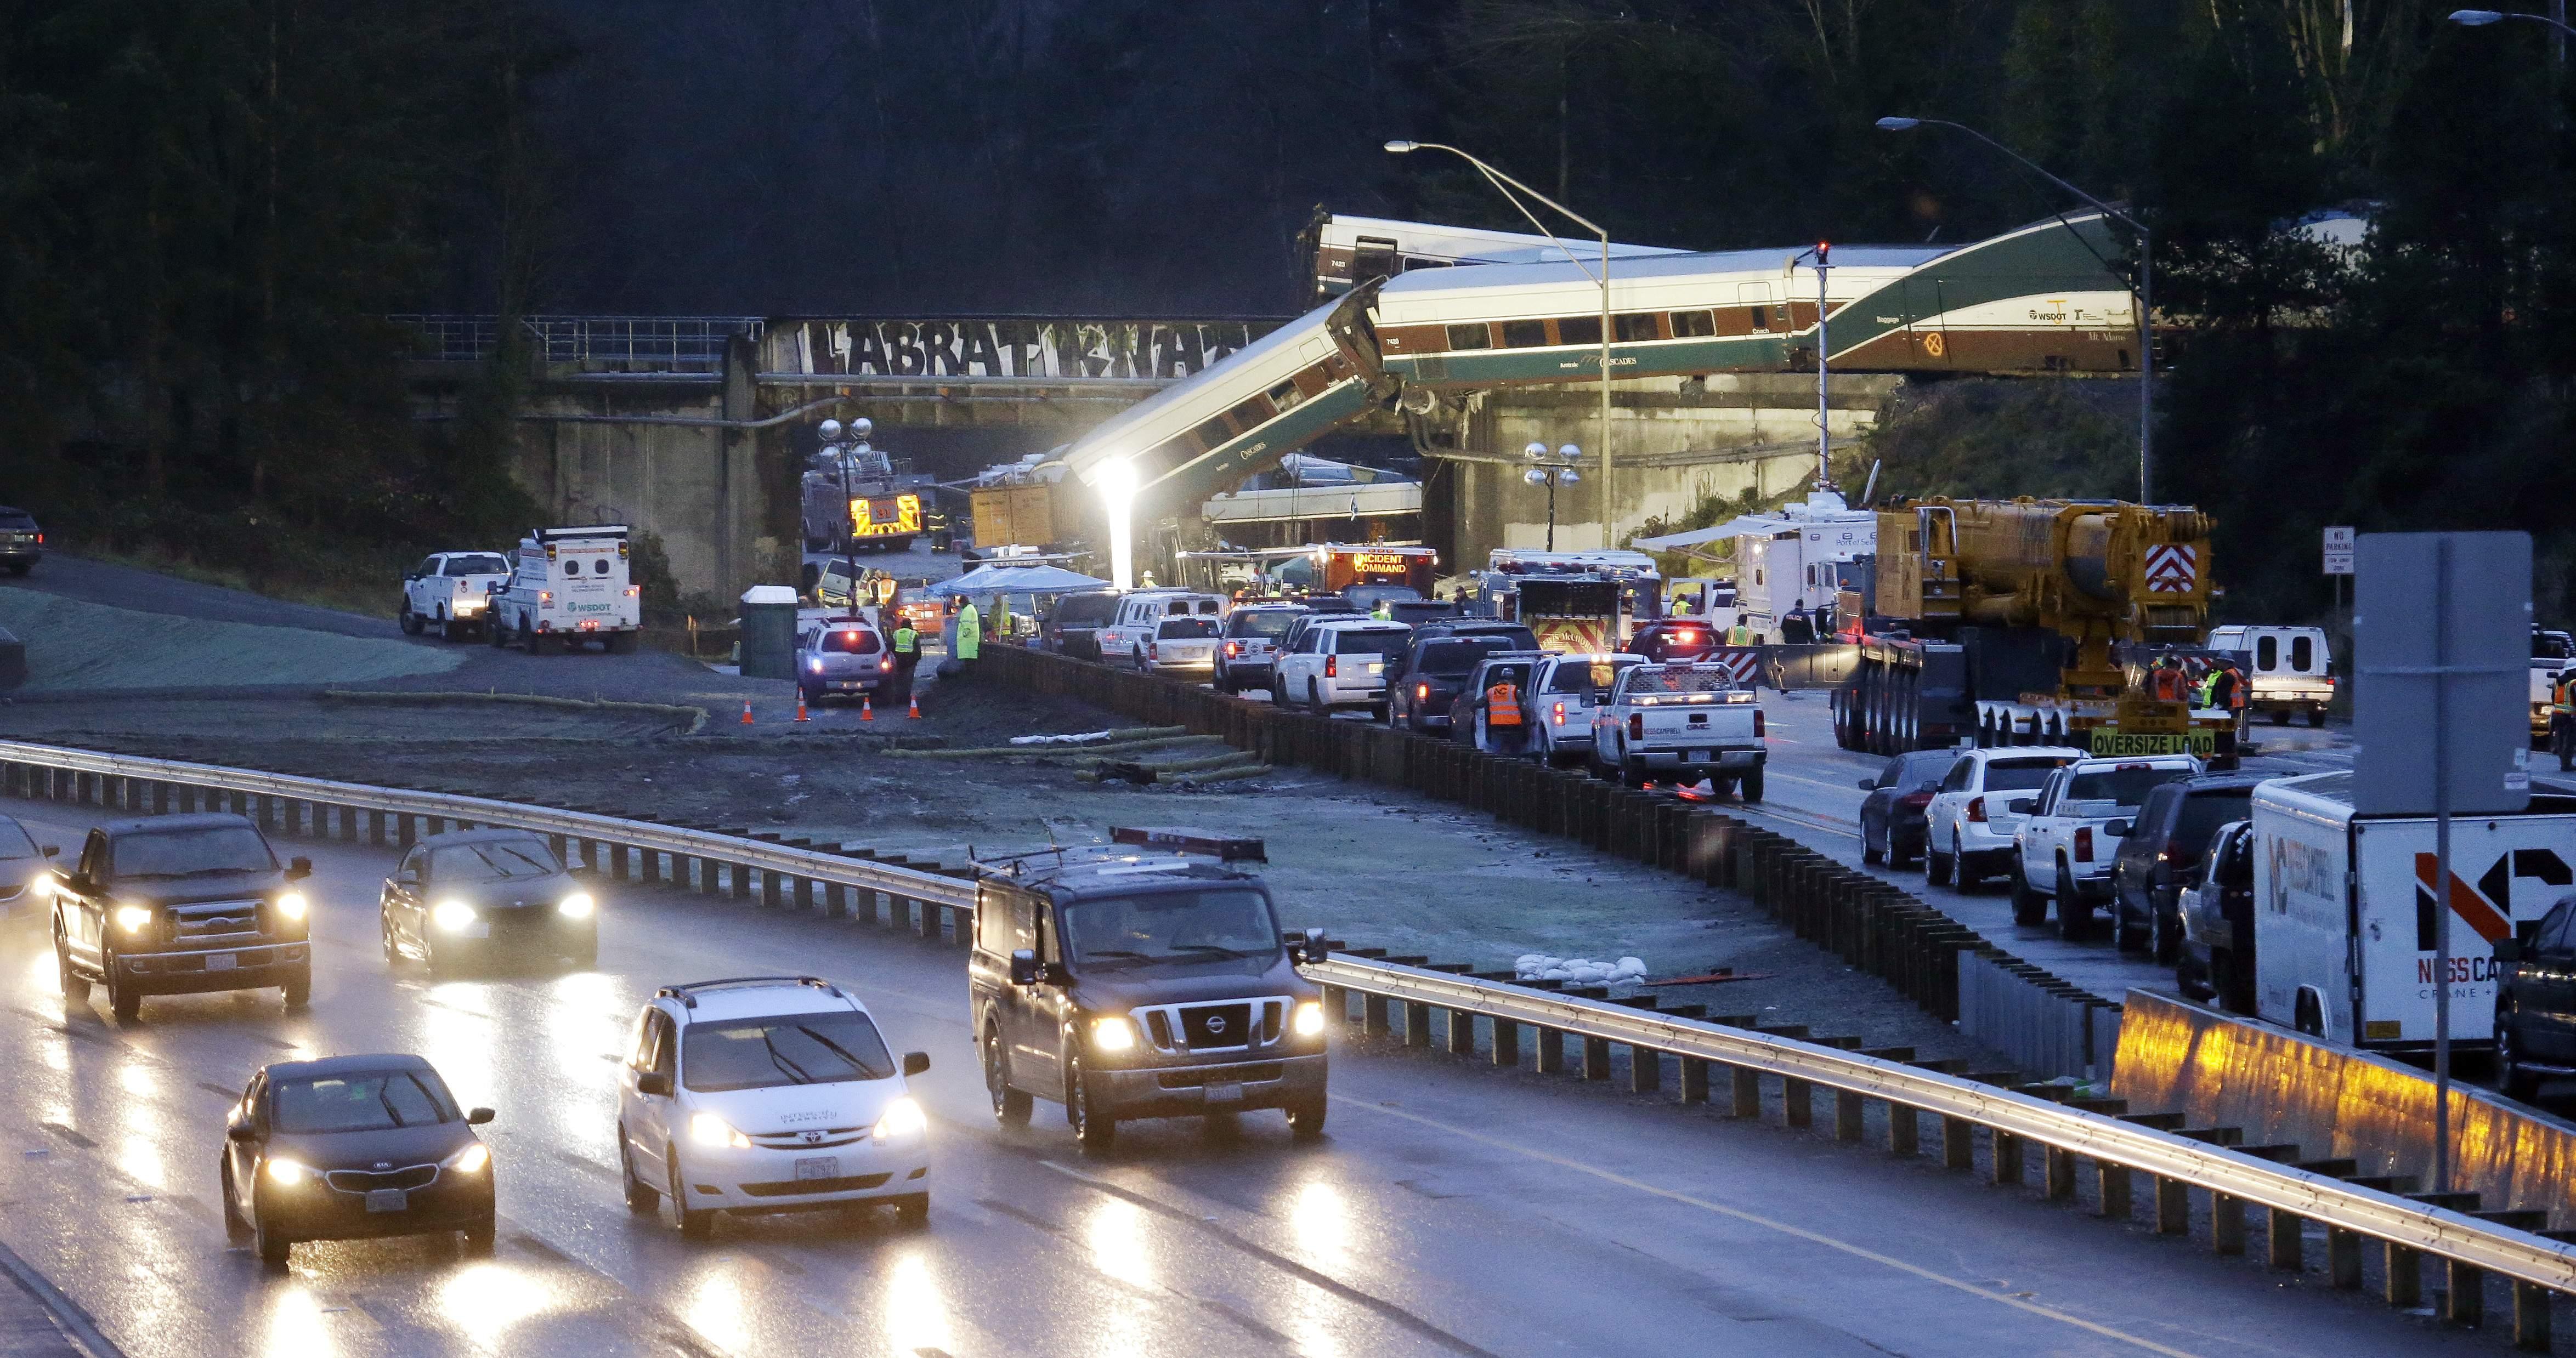 Train speeding 80 mph in 30 mph zone before deadly Tacoma